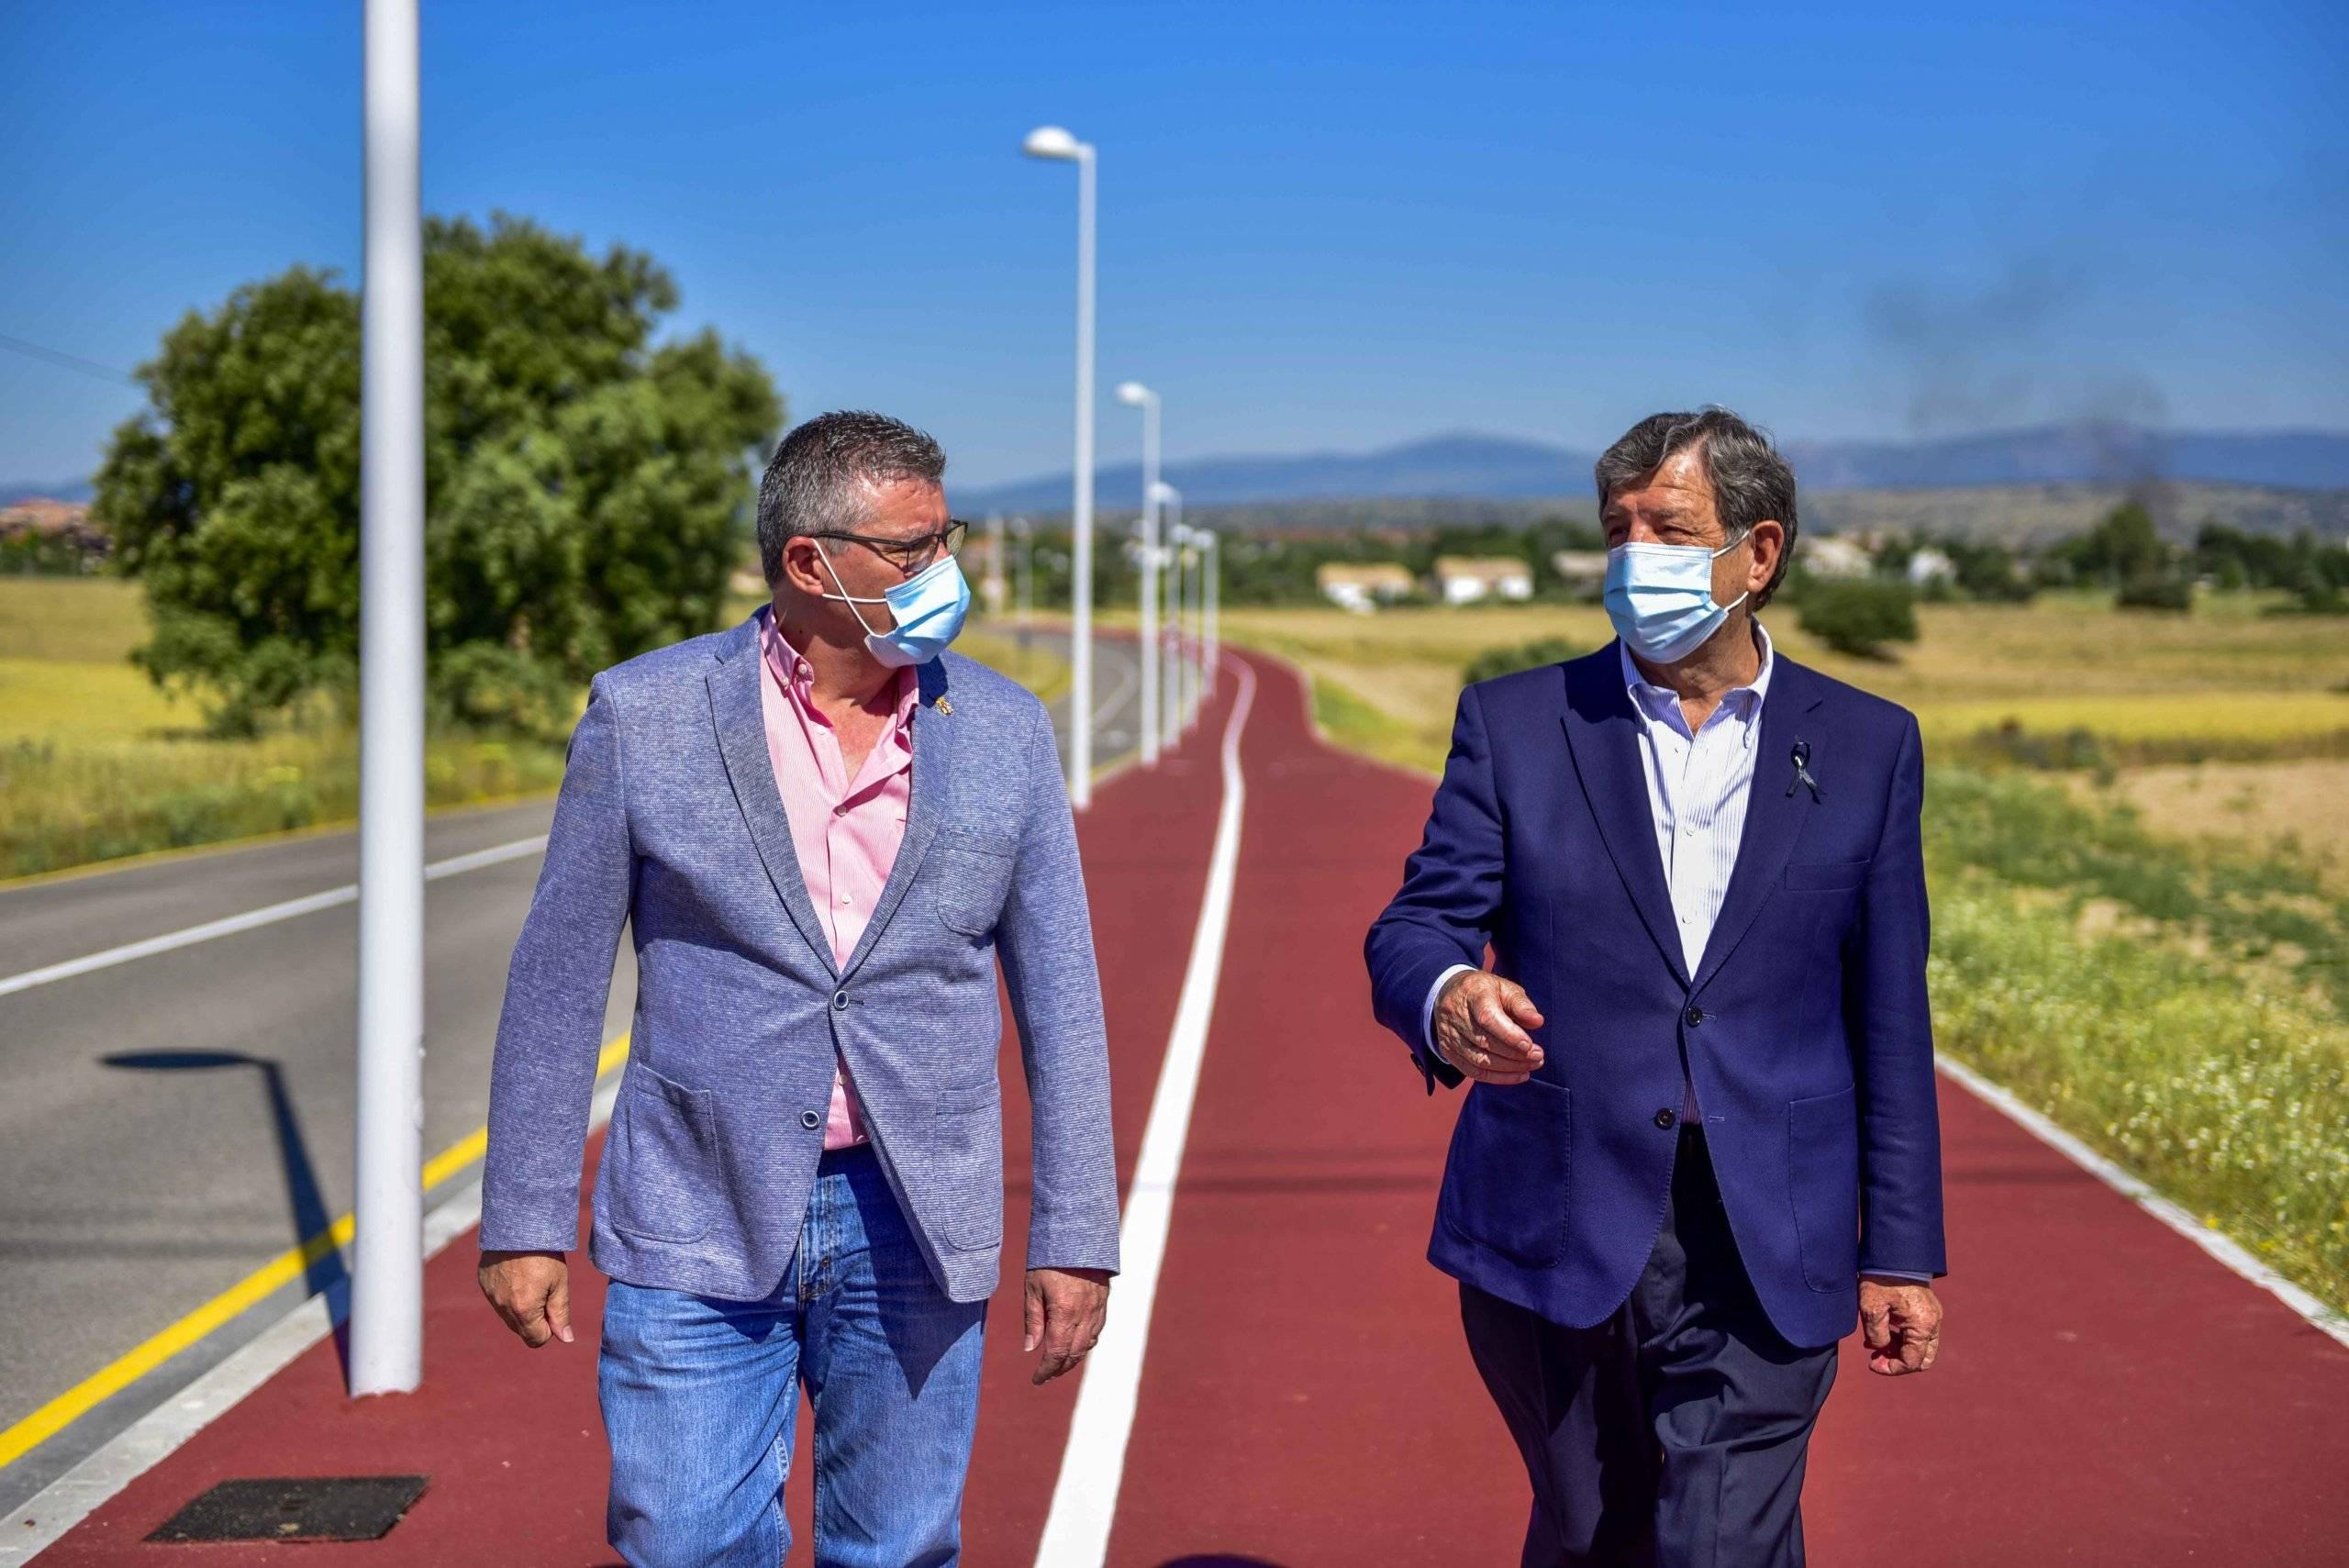 El alcalde, Luis Partida, junto al alcalde de Brunete, Juan Manuel Hoyo.